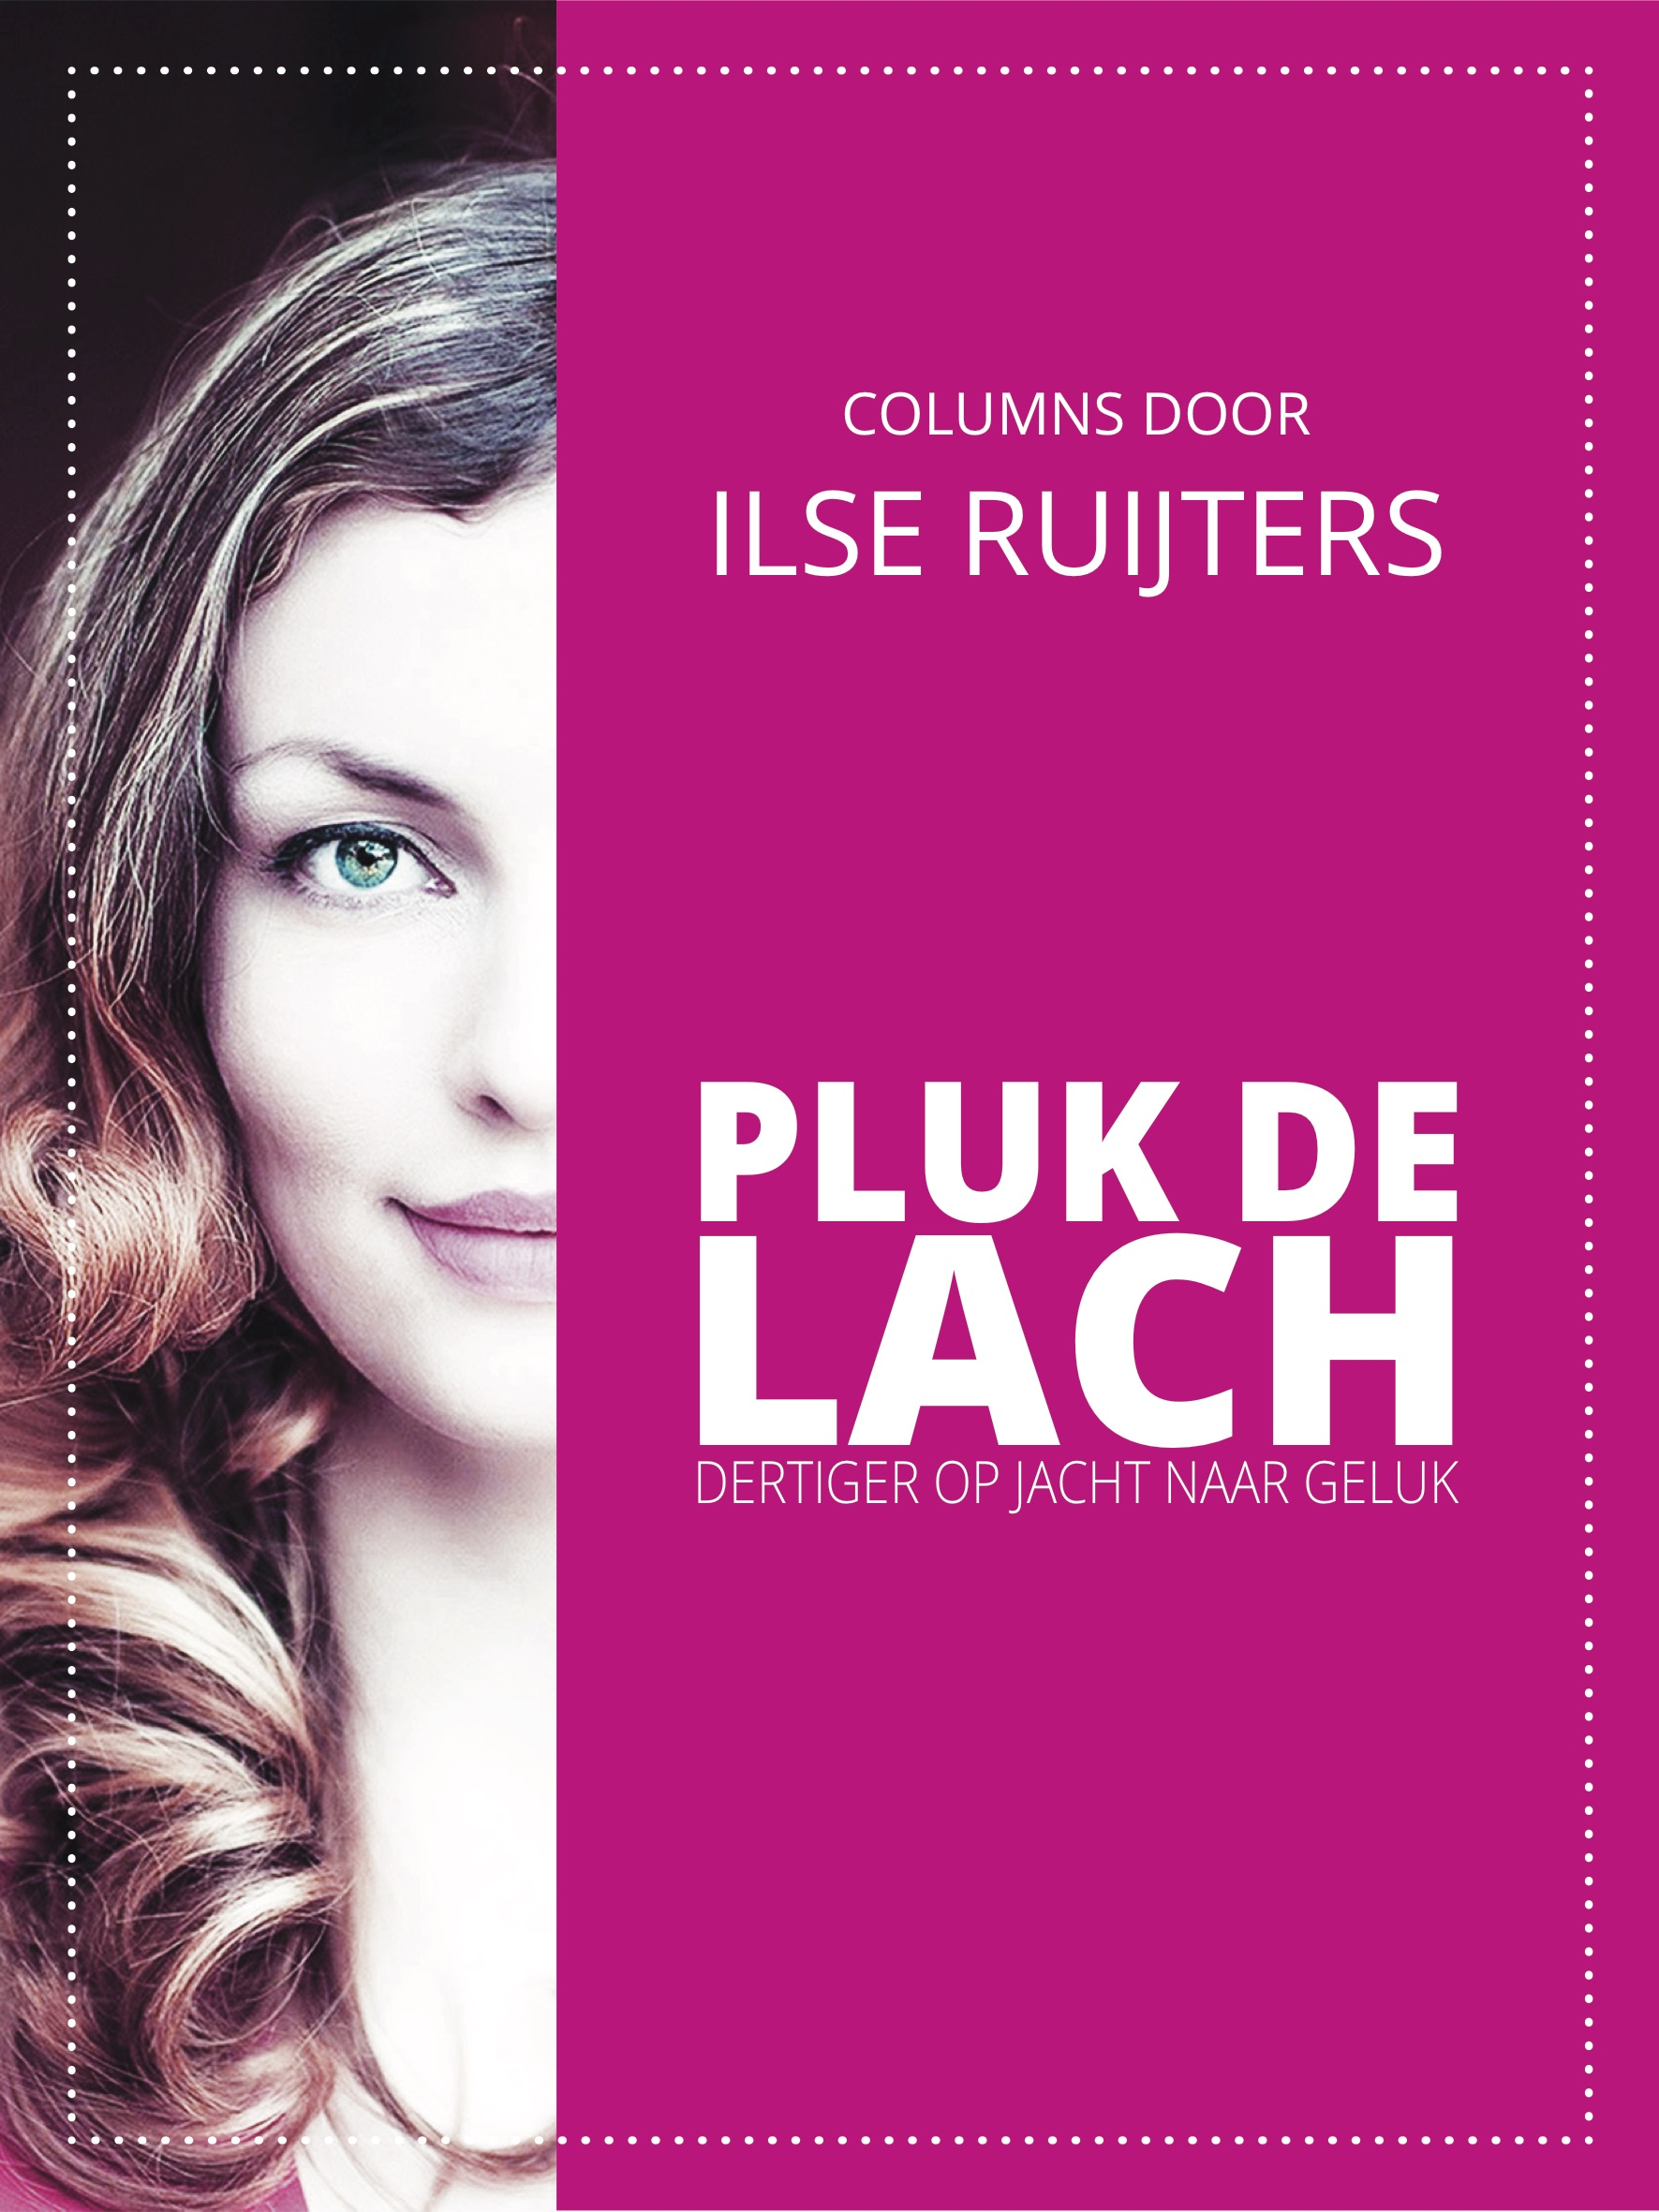 Pluk de lach - Ilse Ruijters